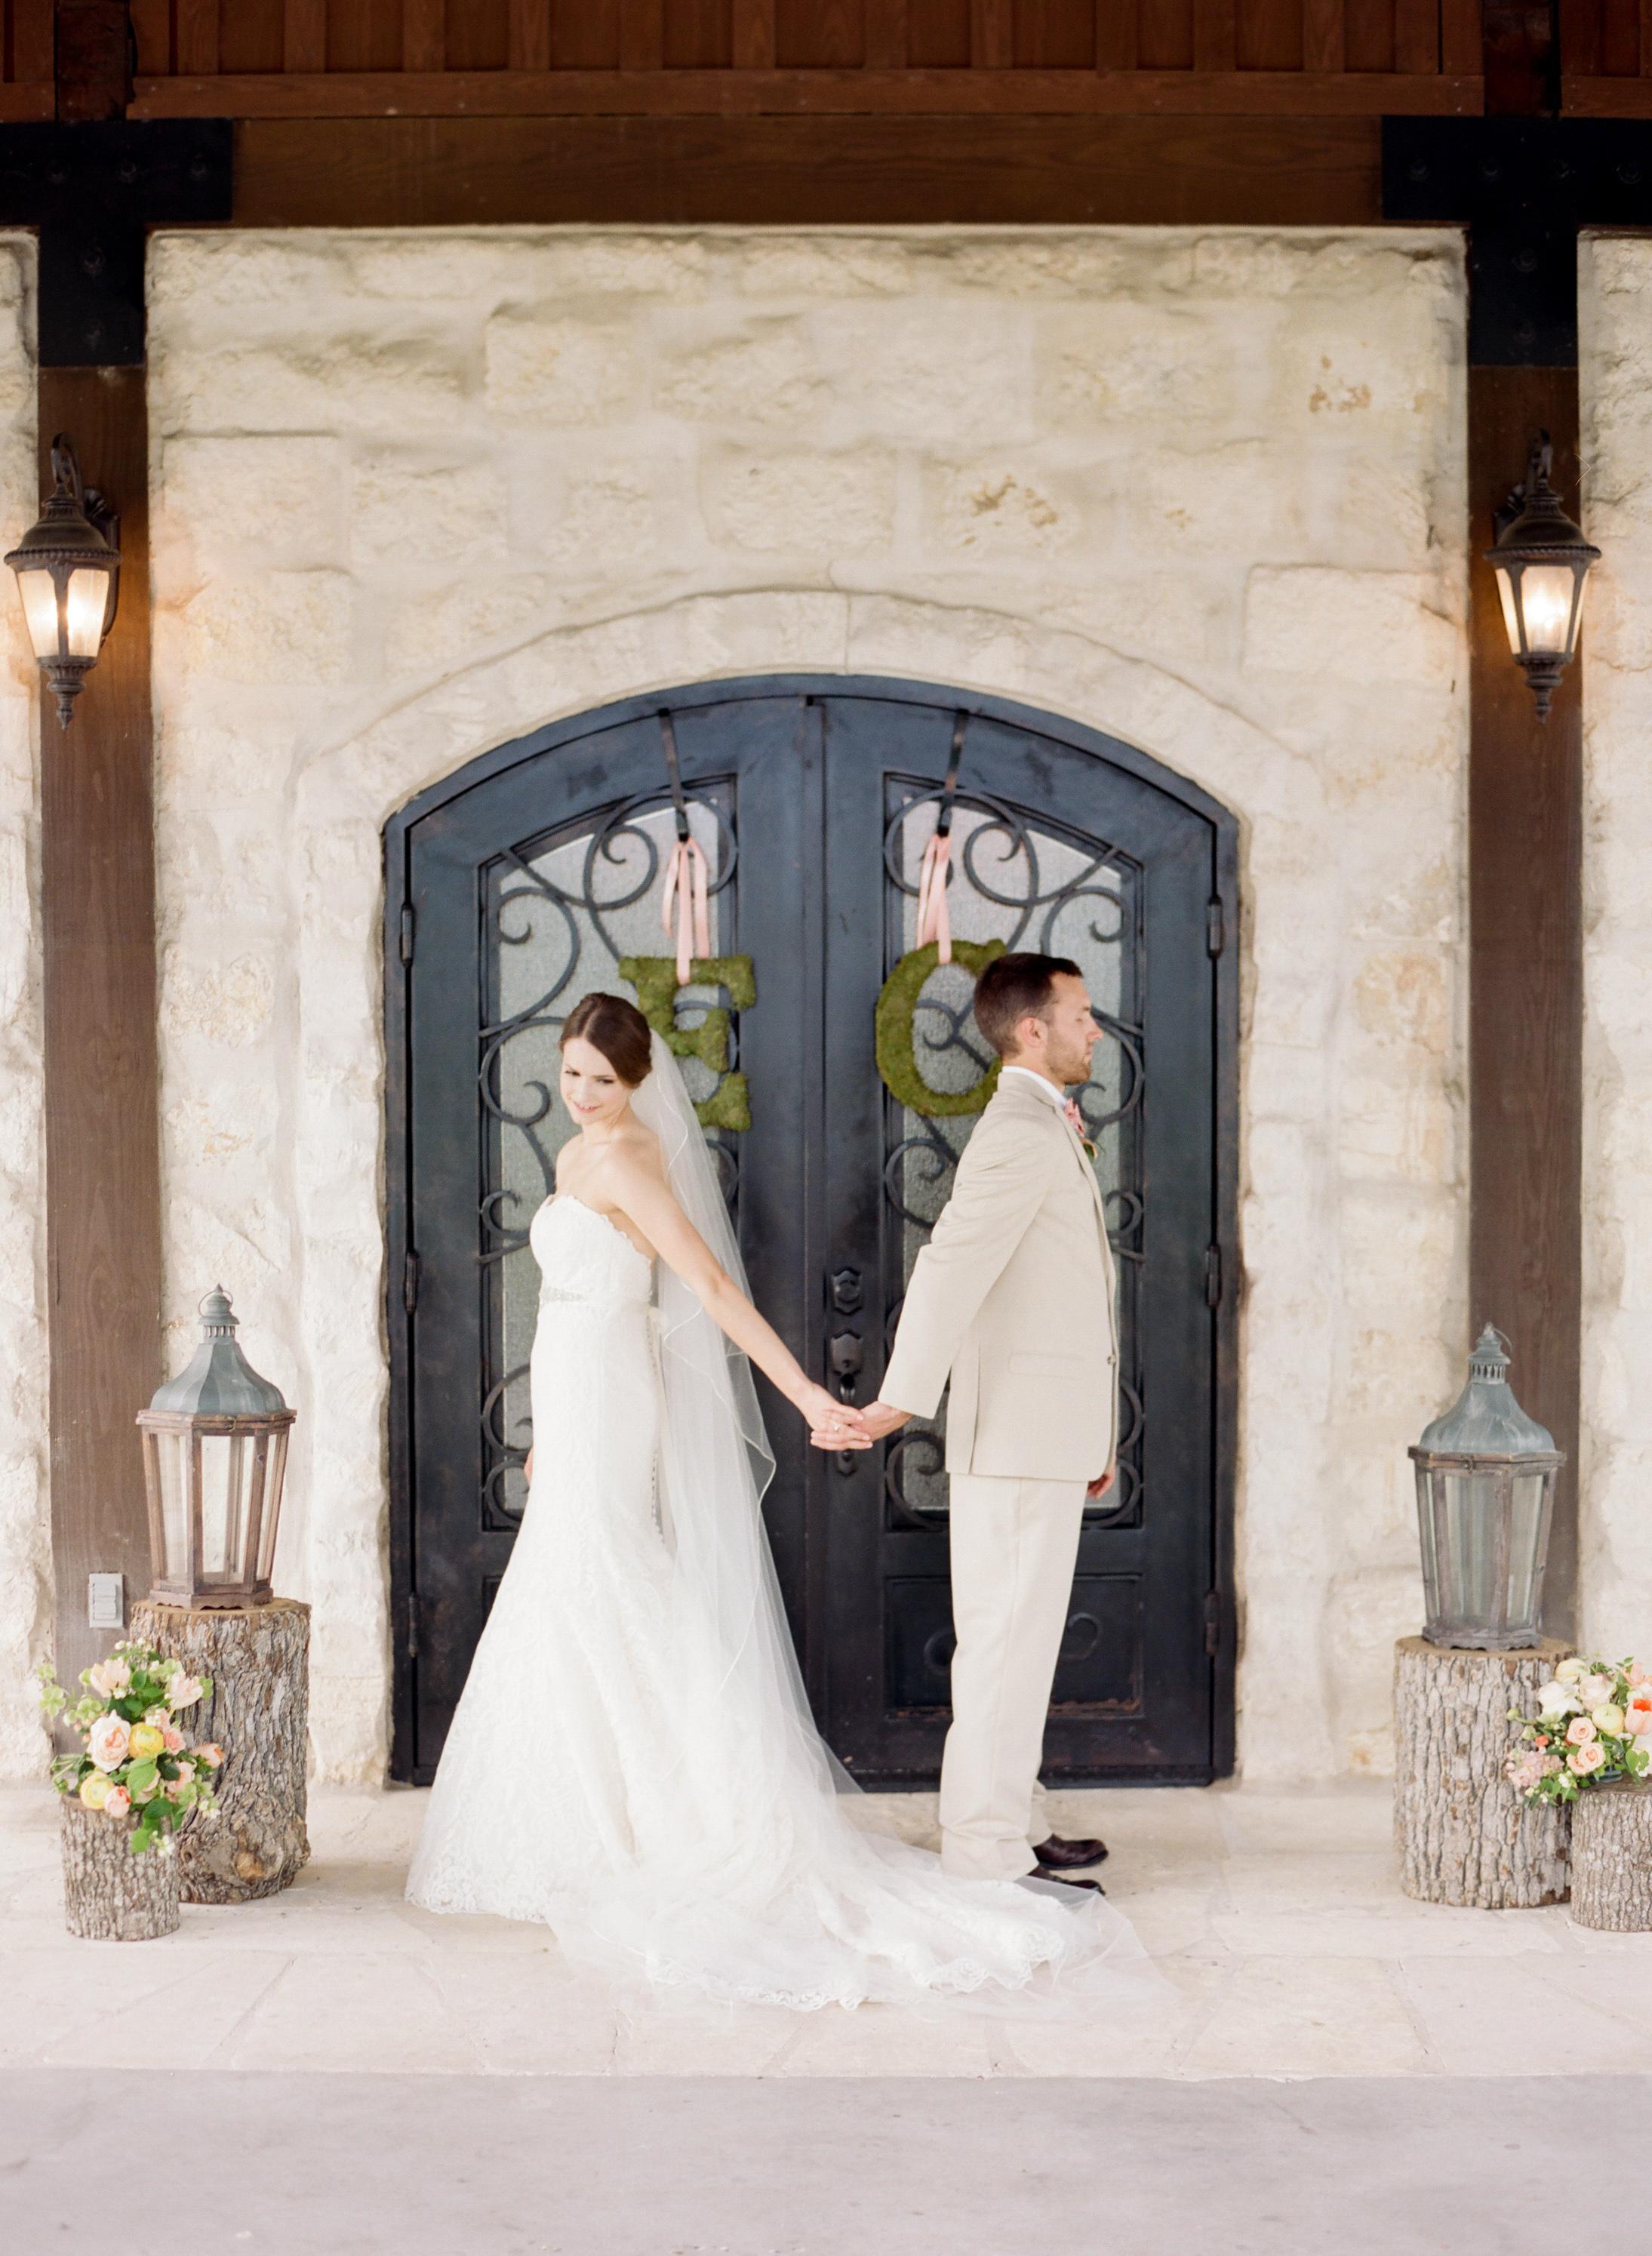 The-Knot-Wedding-Houston-Photographer-Fine-Art-Dana-Fernandez-Photography-Film-18.jpg